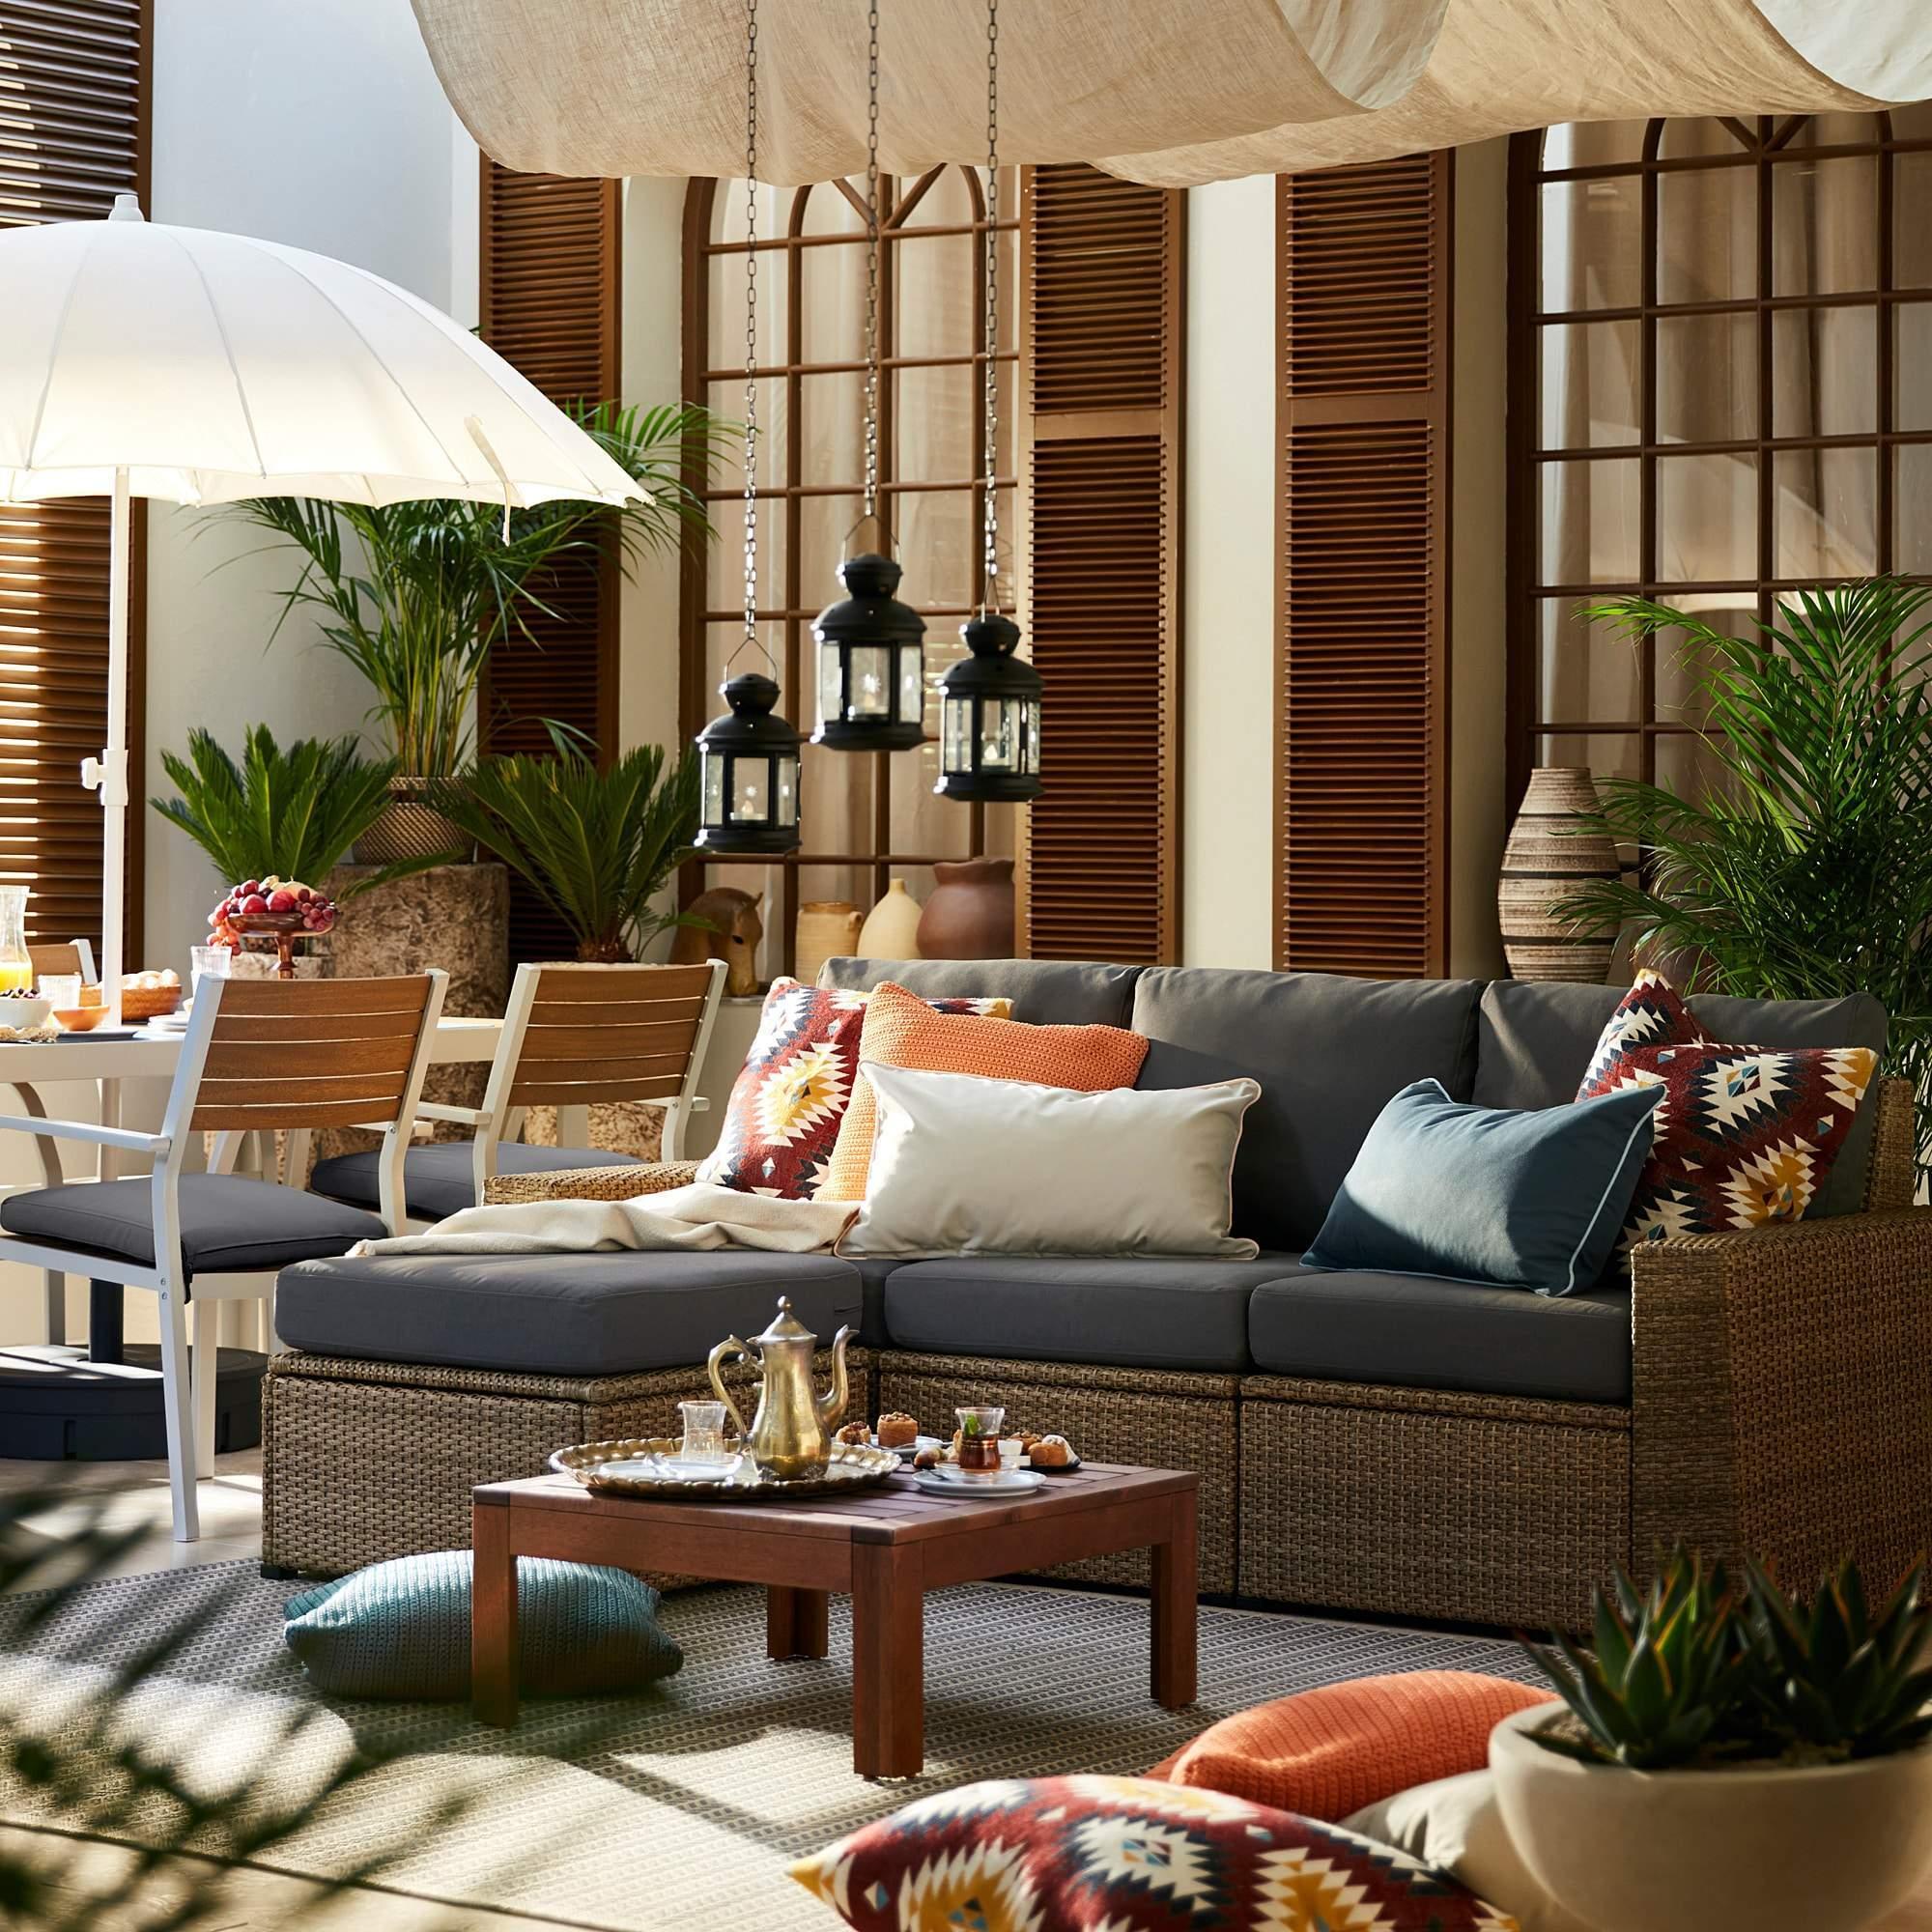 sitzkissen garten inspirierend sollerc296n 3 seat modular sofa outdoor with footstool brown of sitzkissen garten